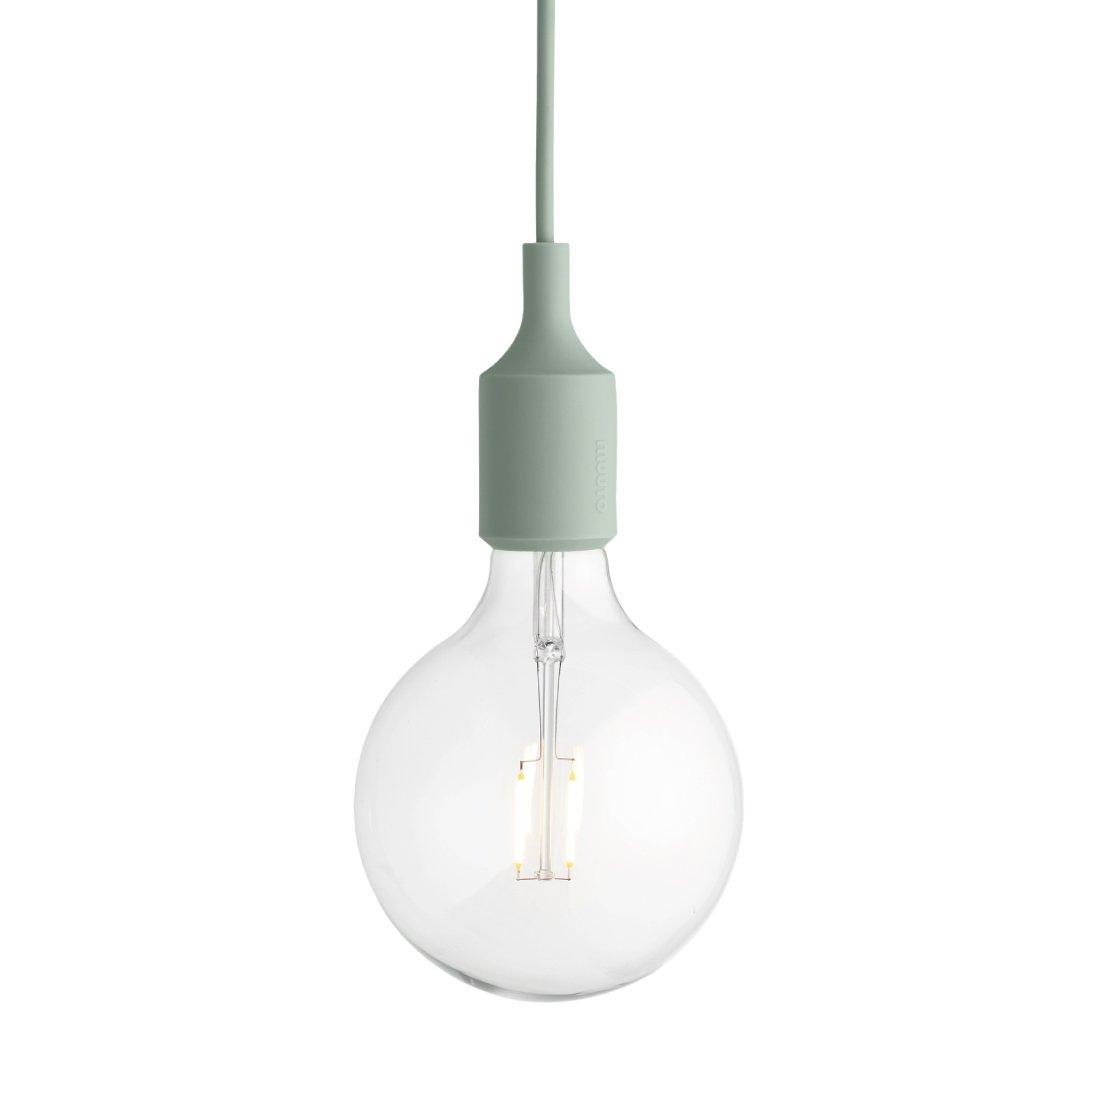 Muuto E27 Hanglamp LED - Same Day Delivery